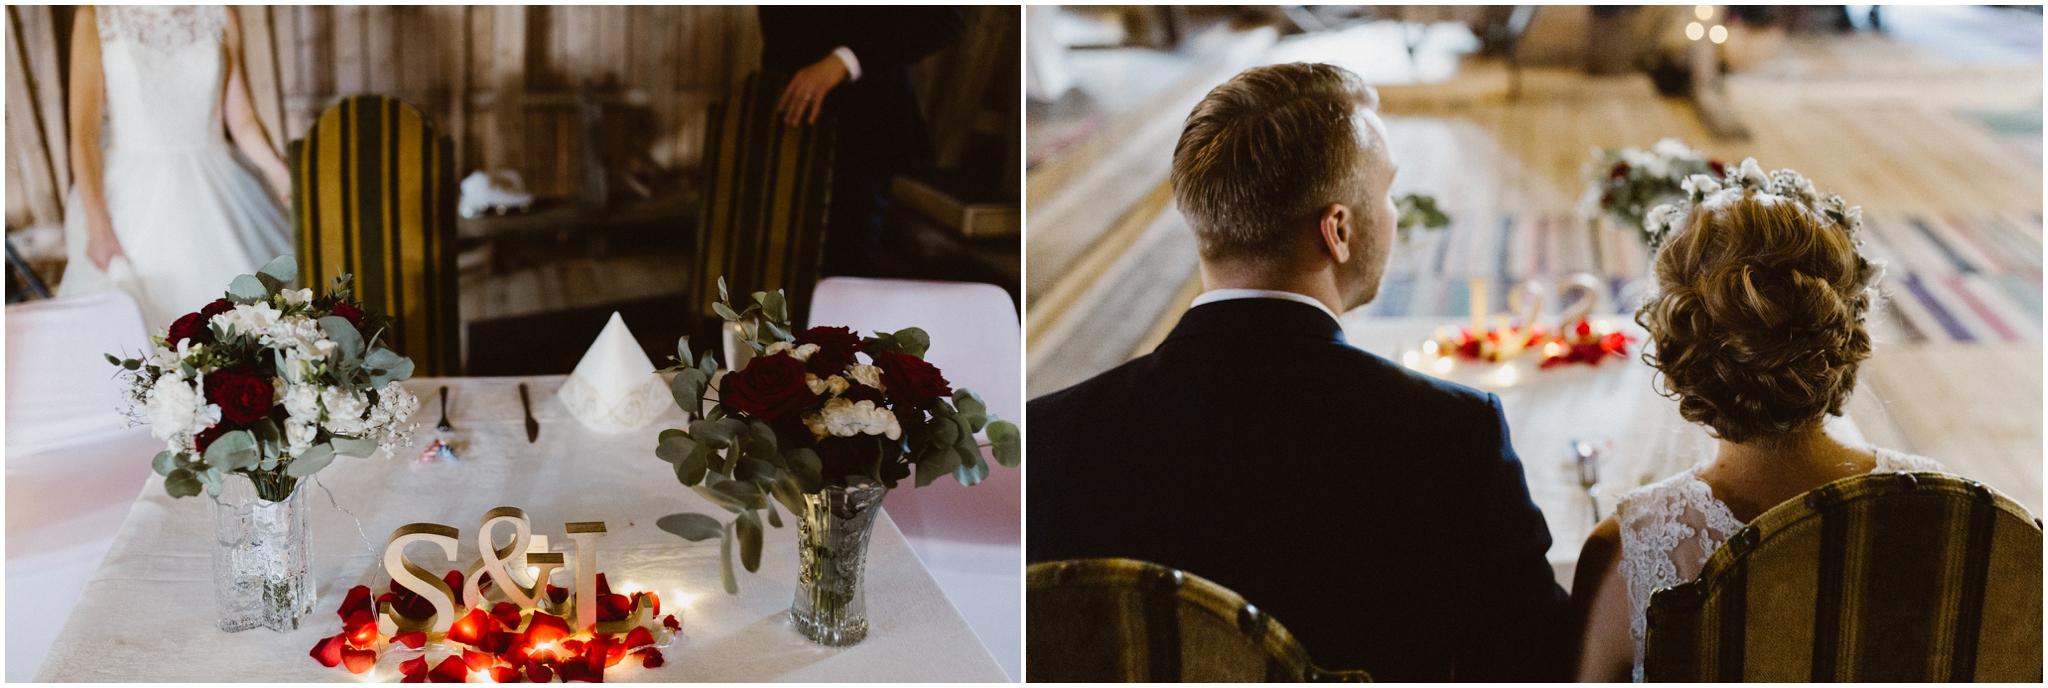 Leevi + Susanna -- Patrick Karkkolainen Wedding Photographer + Adventurer-176.jpg